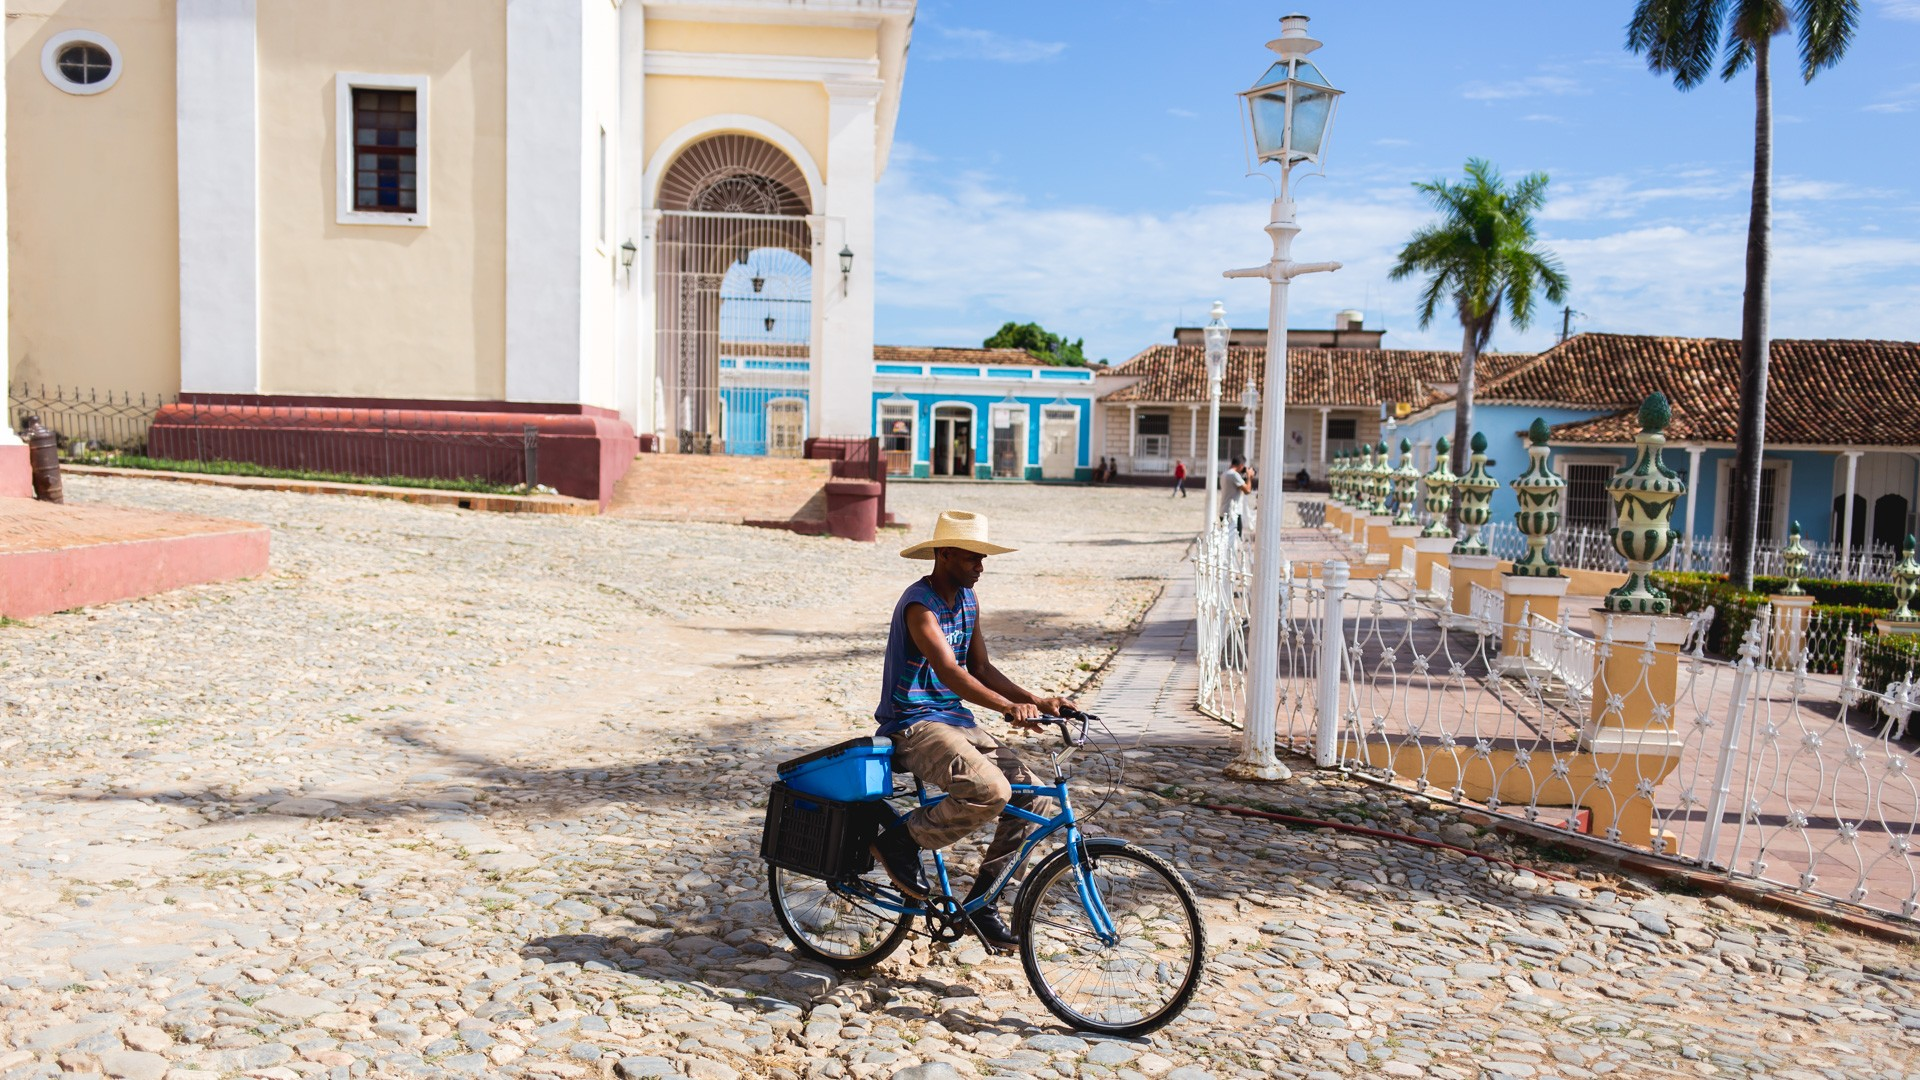 Damien-Dohmen-Photographe-Cuba-29